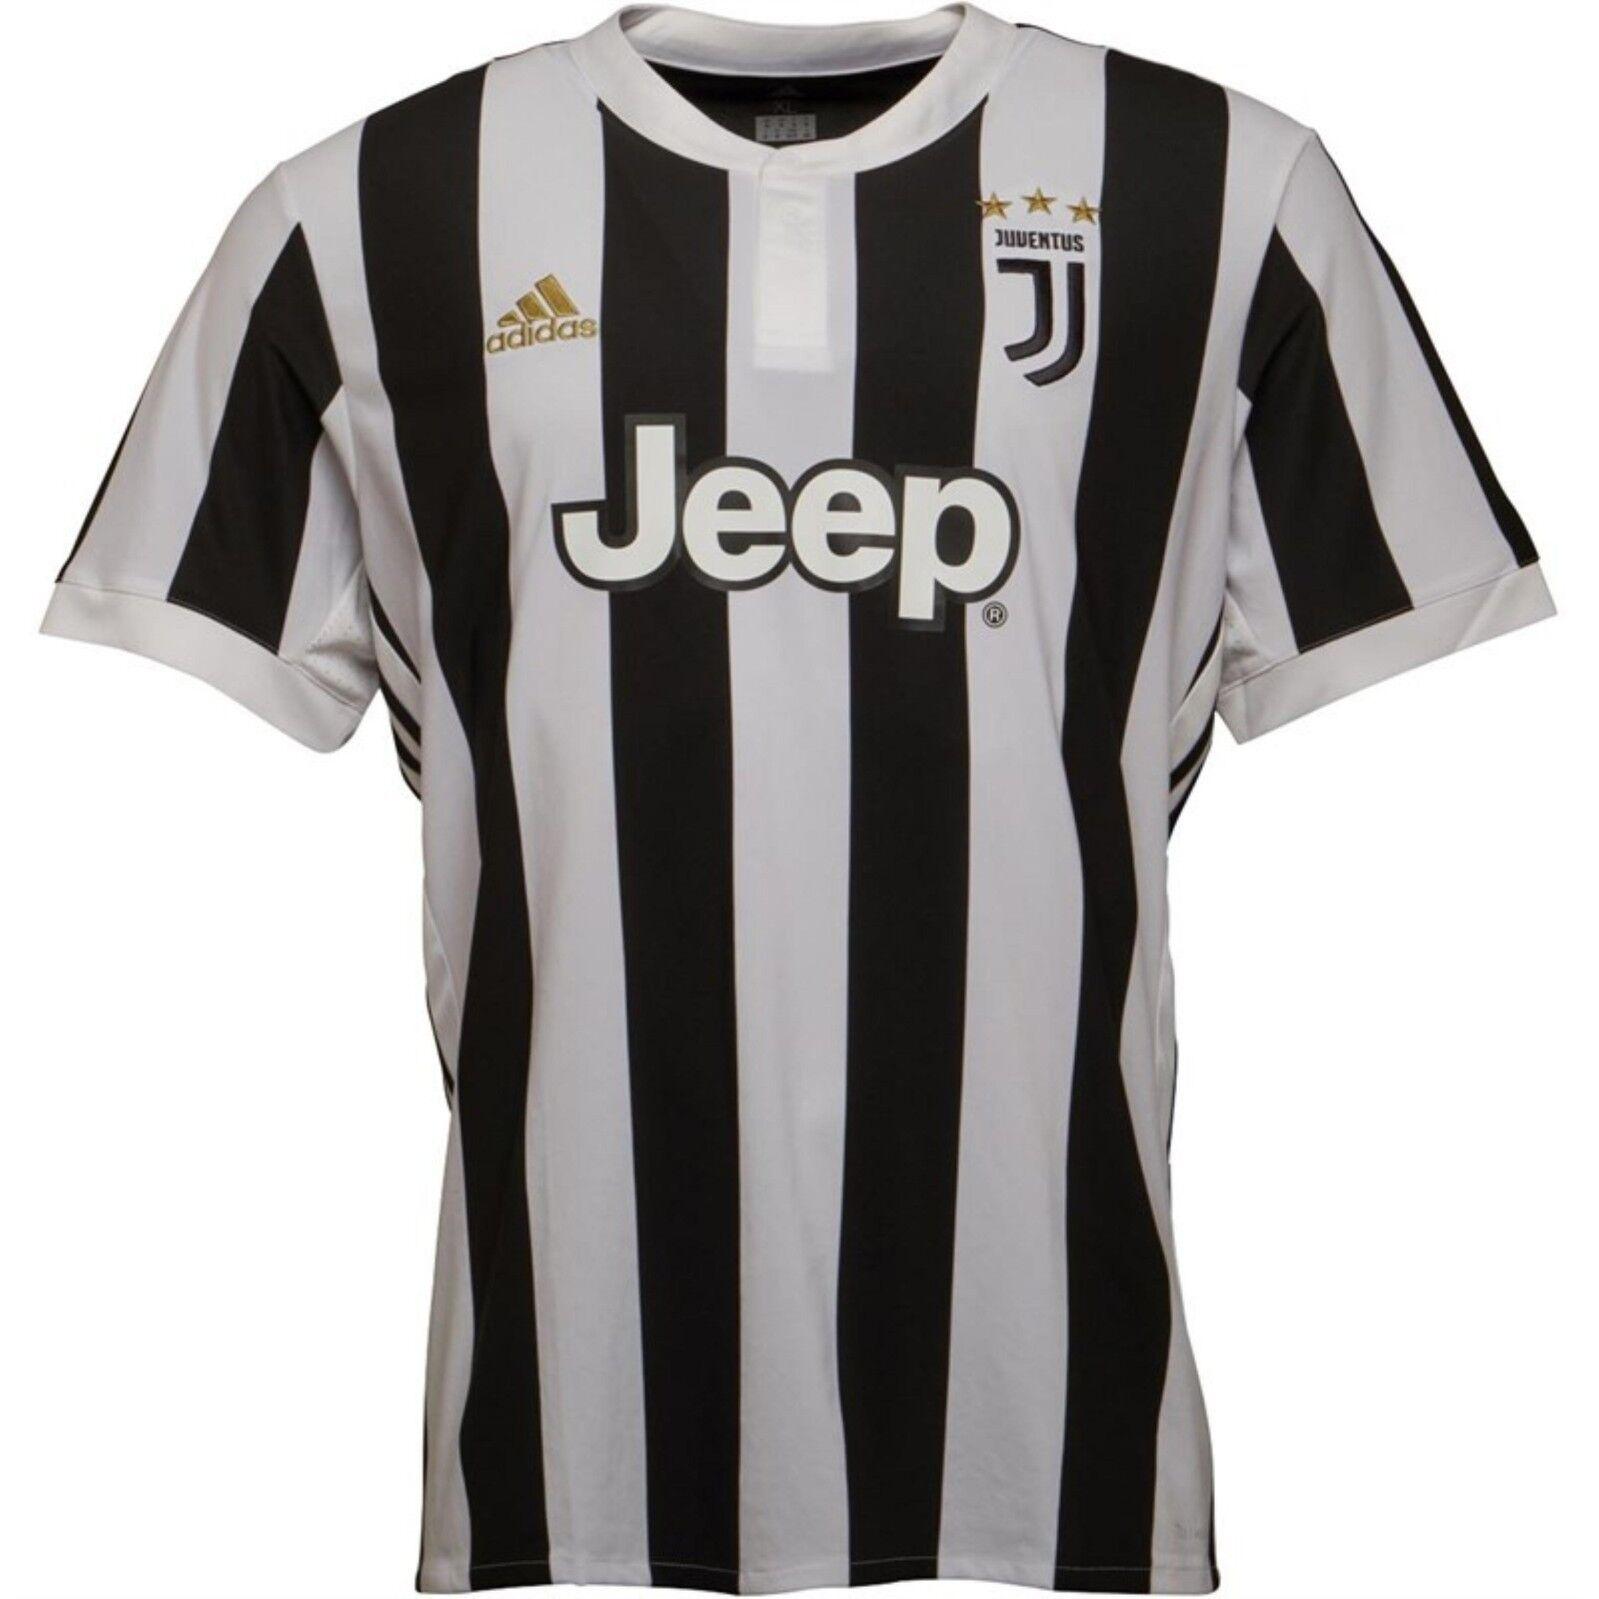 ADIDAS Da Uomo Comando interforze Juventus Maglietta BiancoNeroTaglia XXL